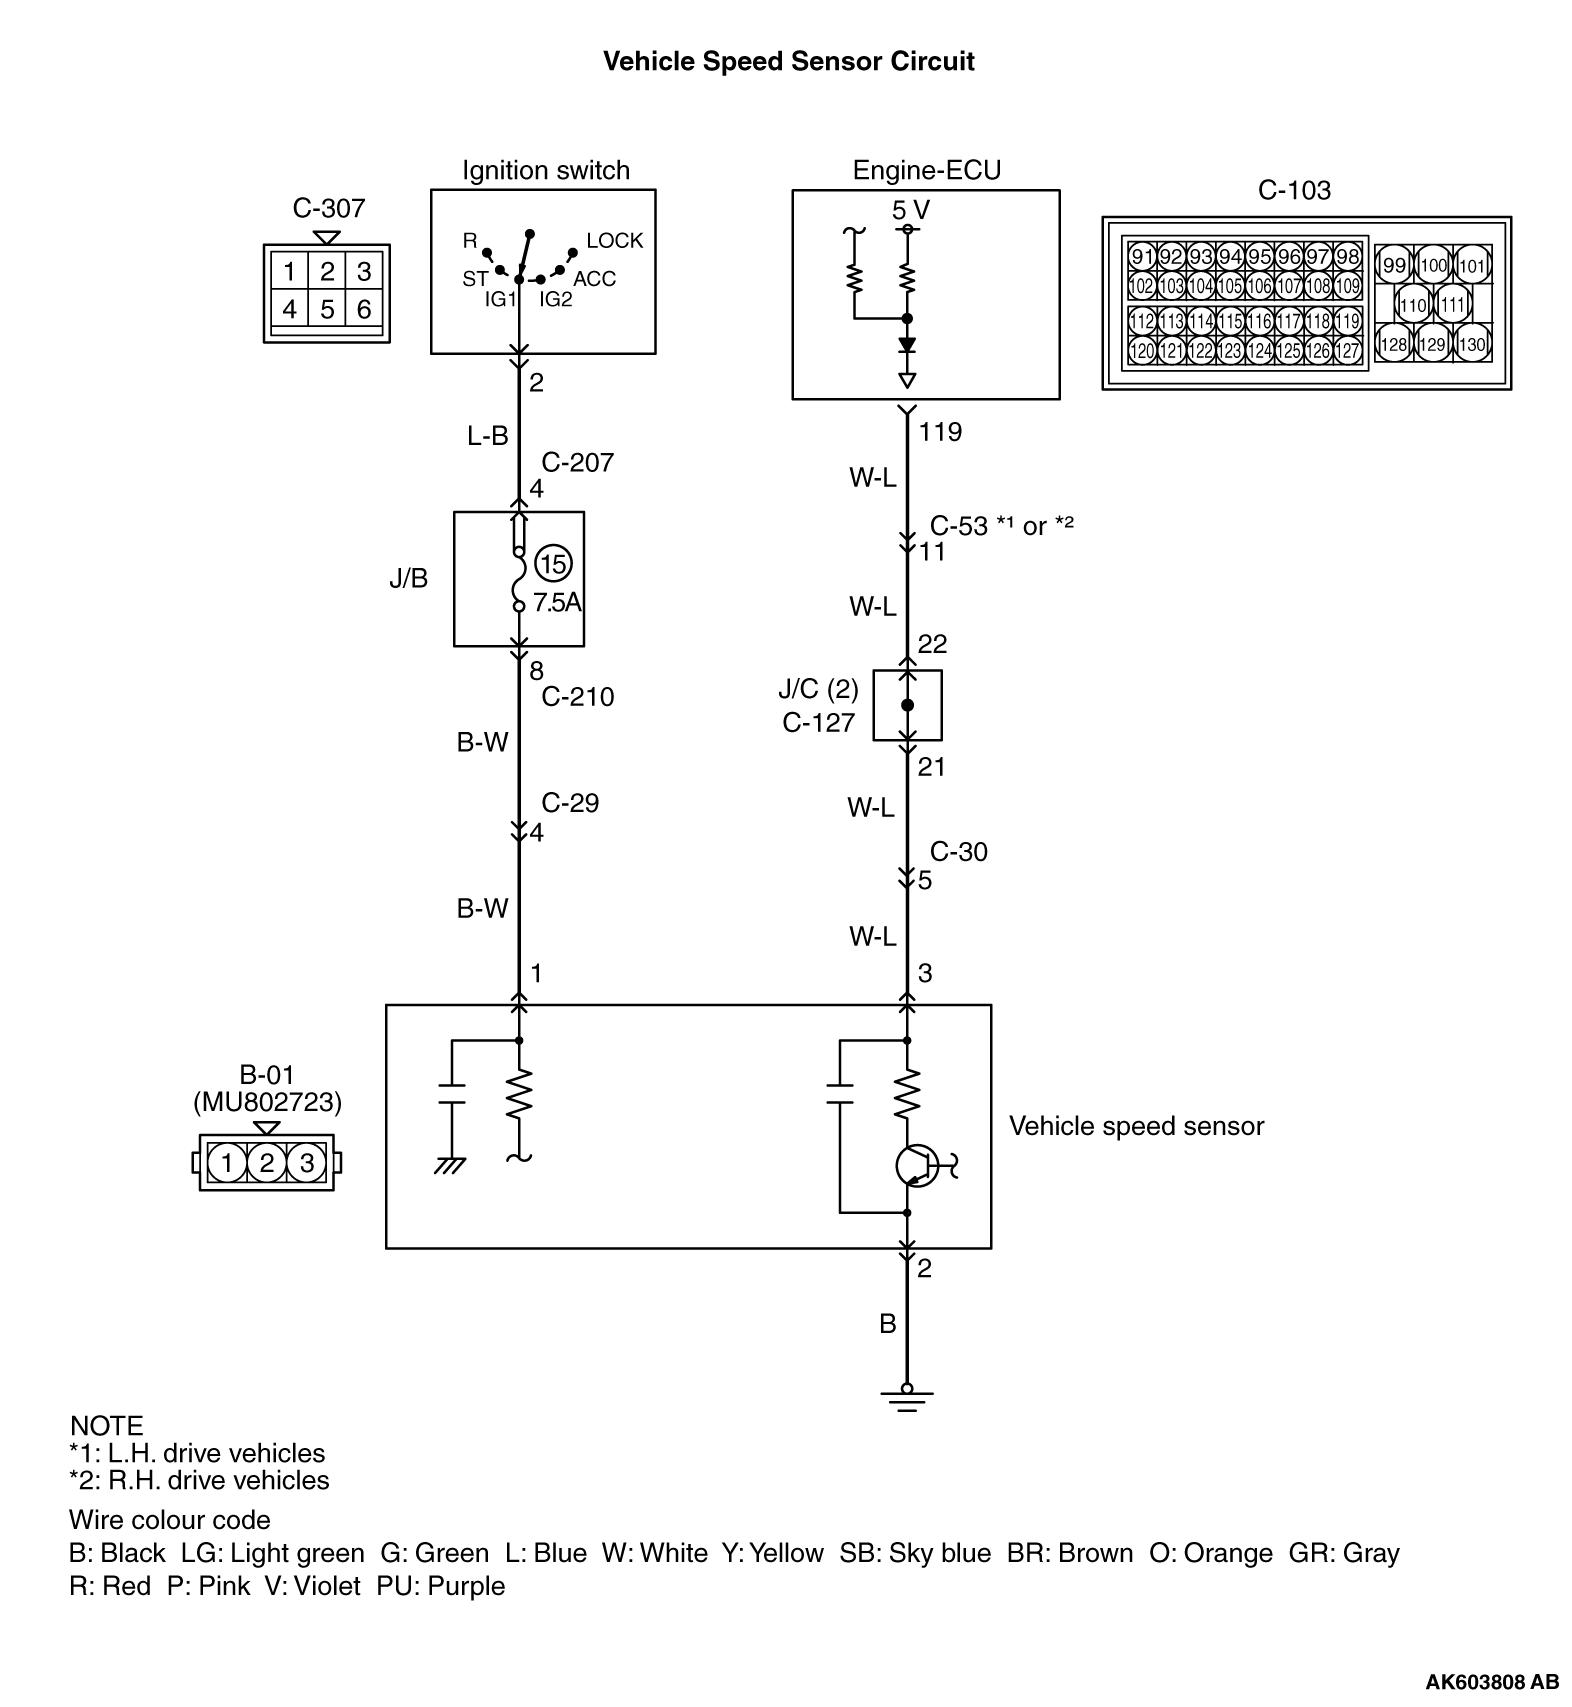 Code No  P0502: Vehicle Speed Sensor Low Input